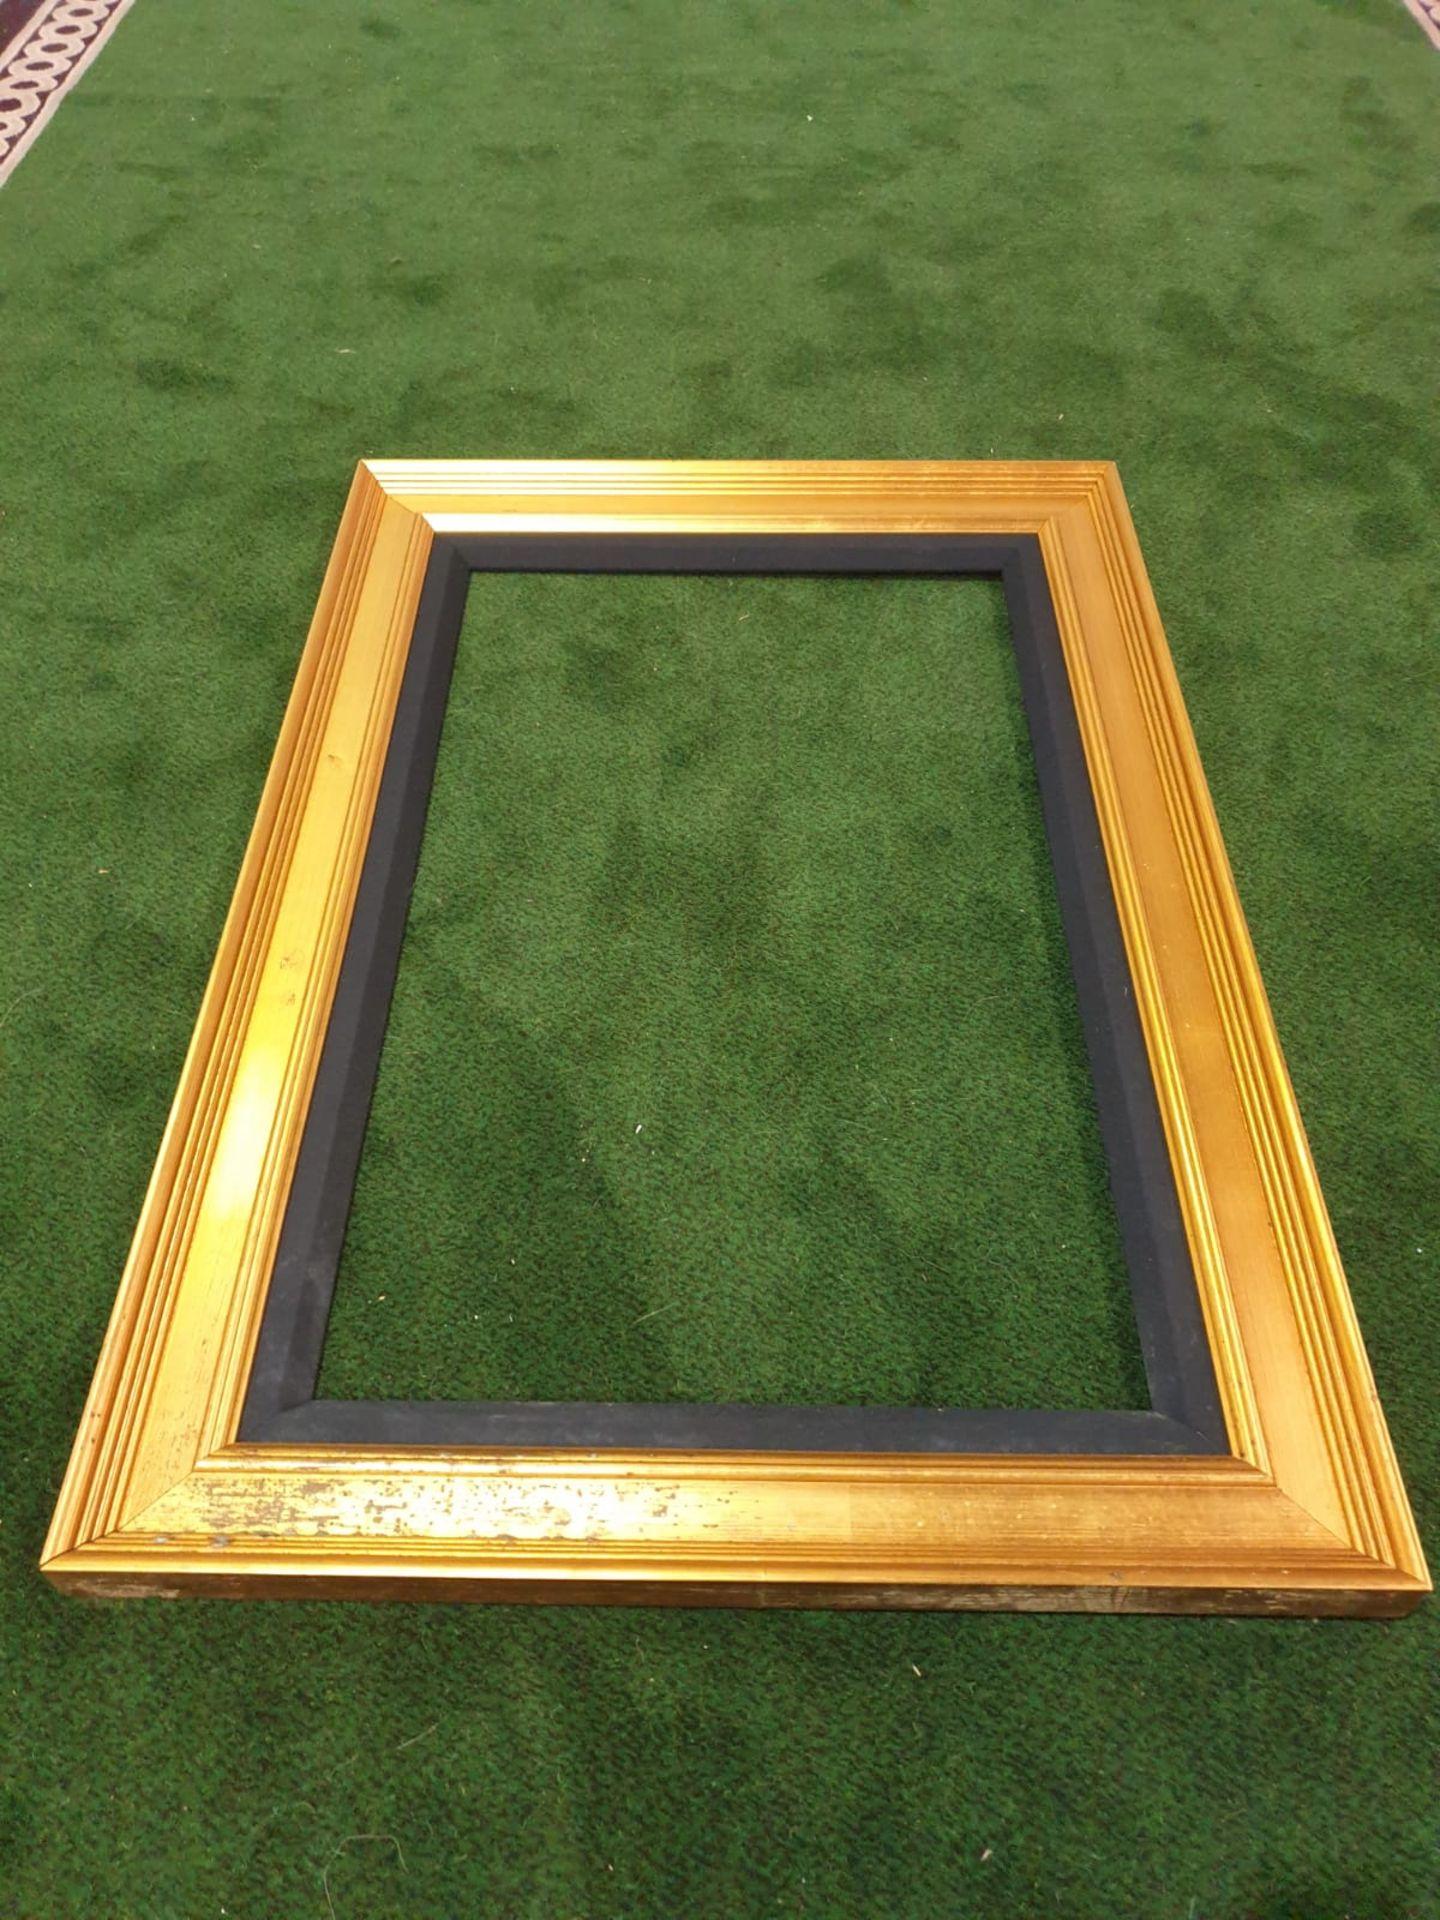 Gilt picture frame 80 x 116cm